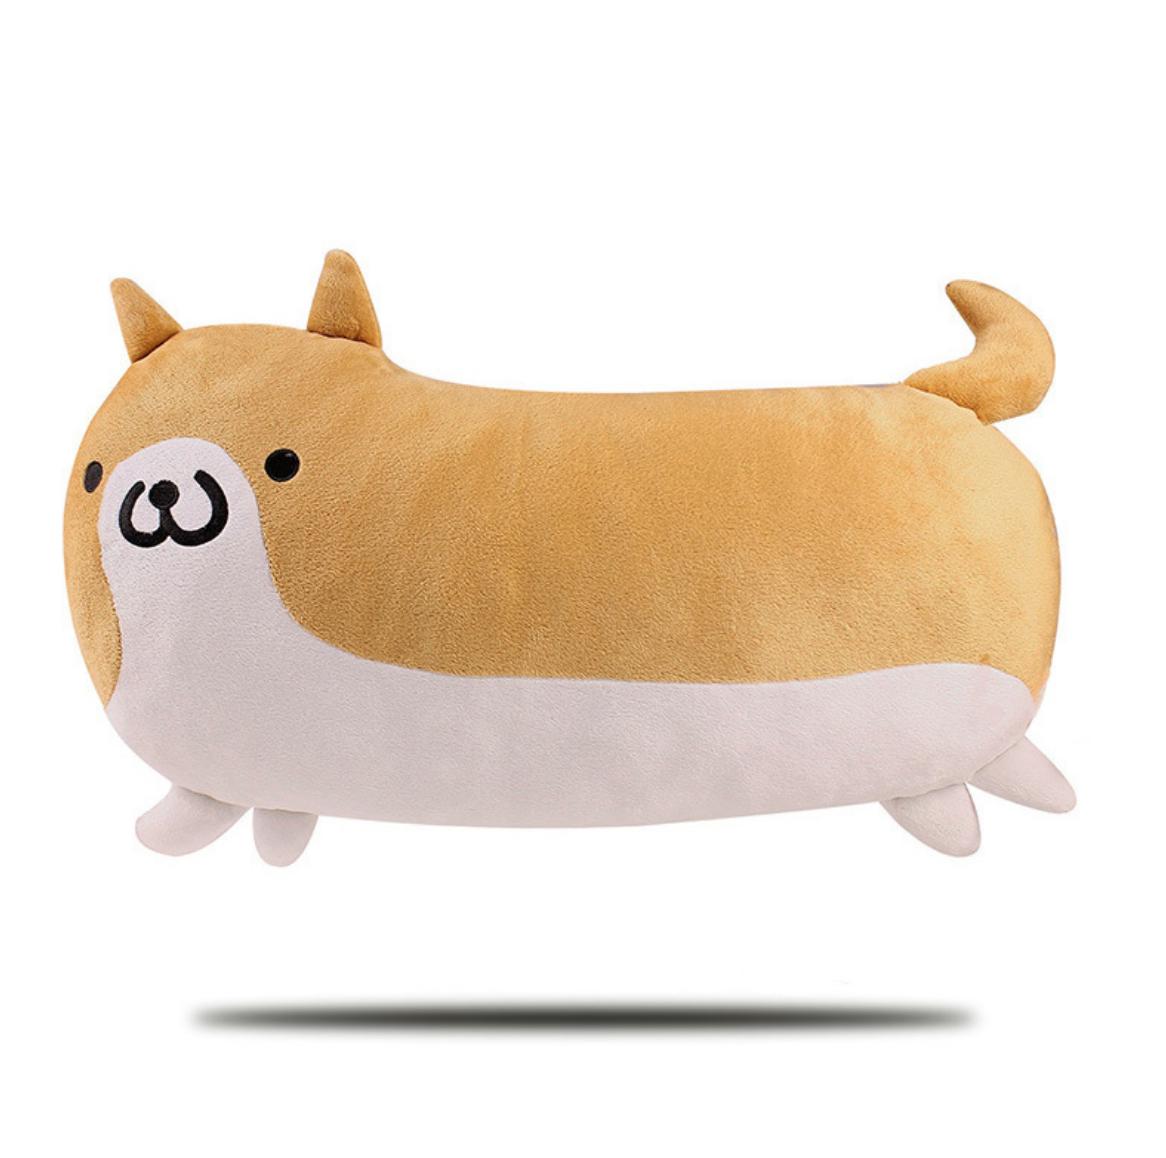 Dog Meme Plush Toy